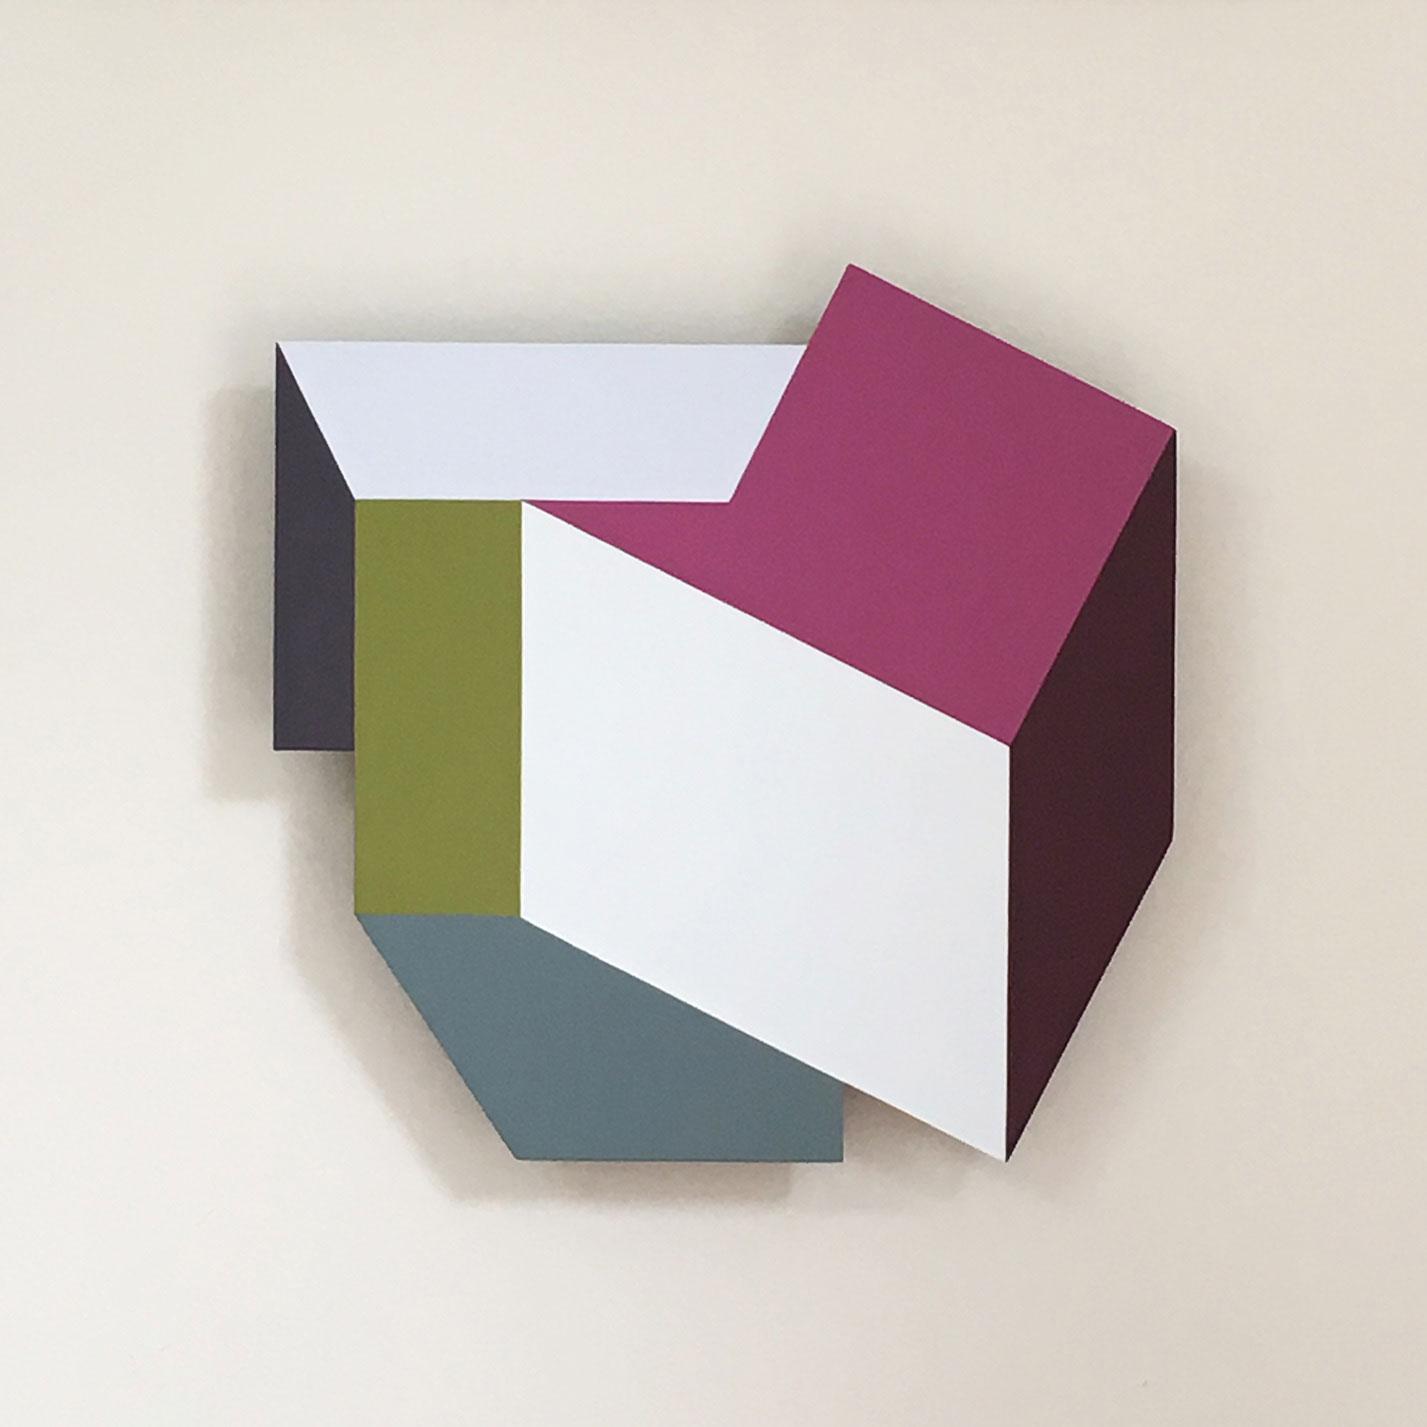 Block - original painting by Amanda Wilkinson